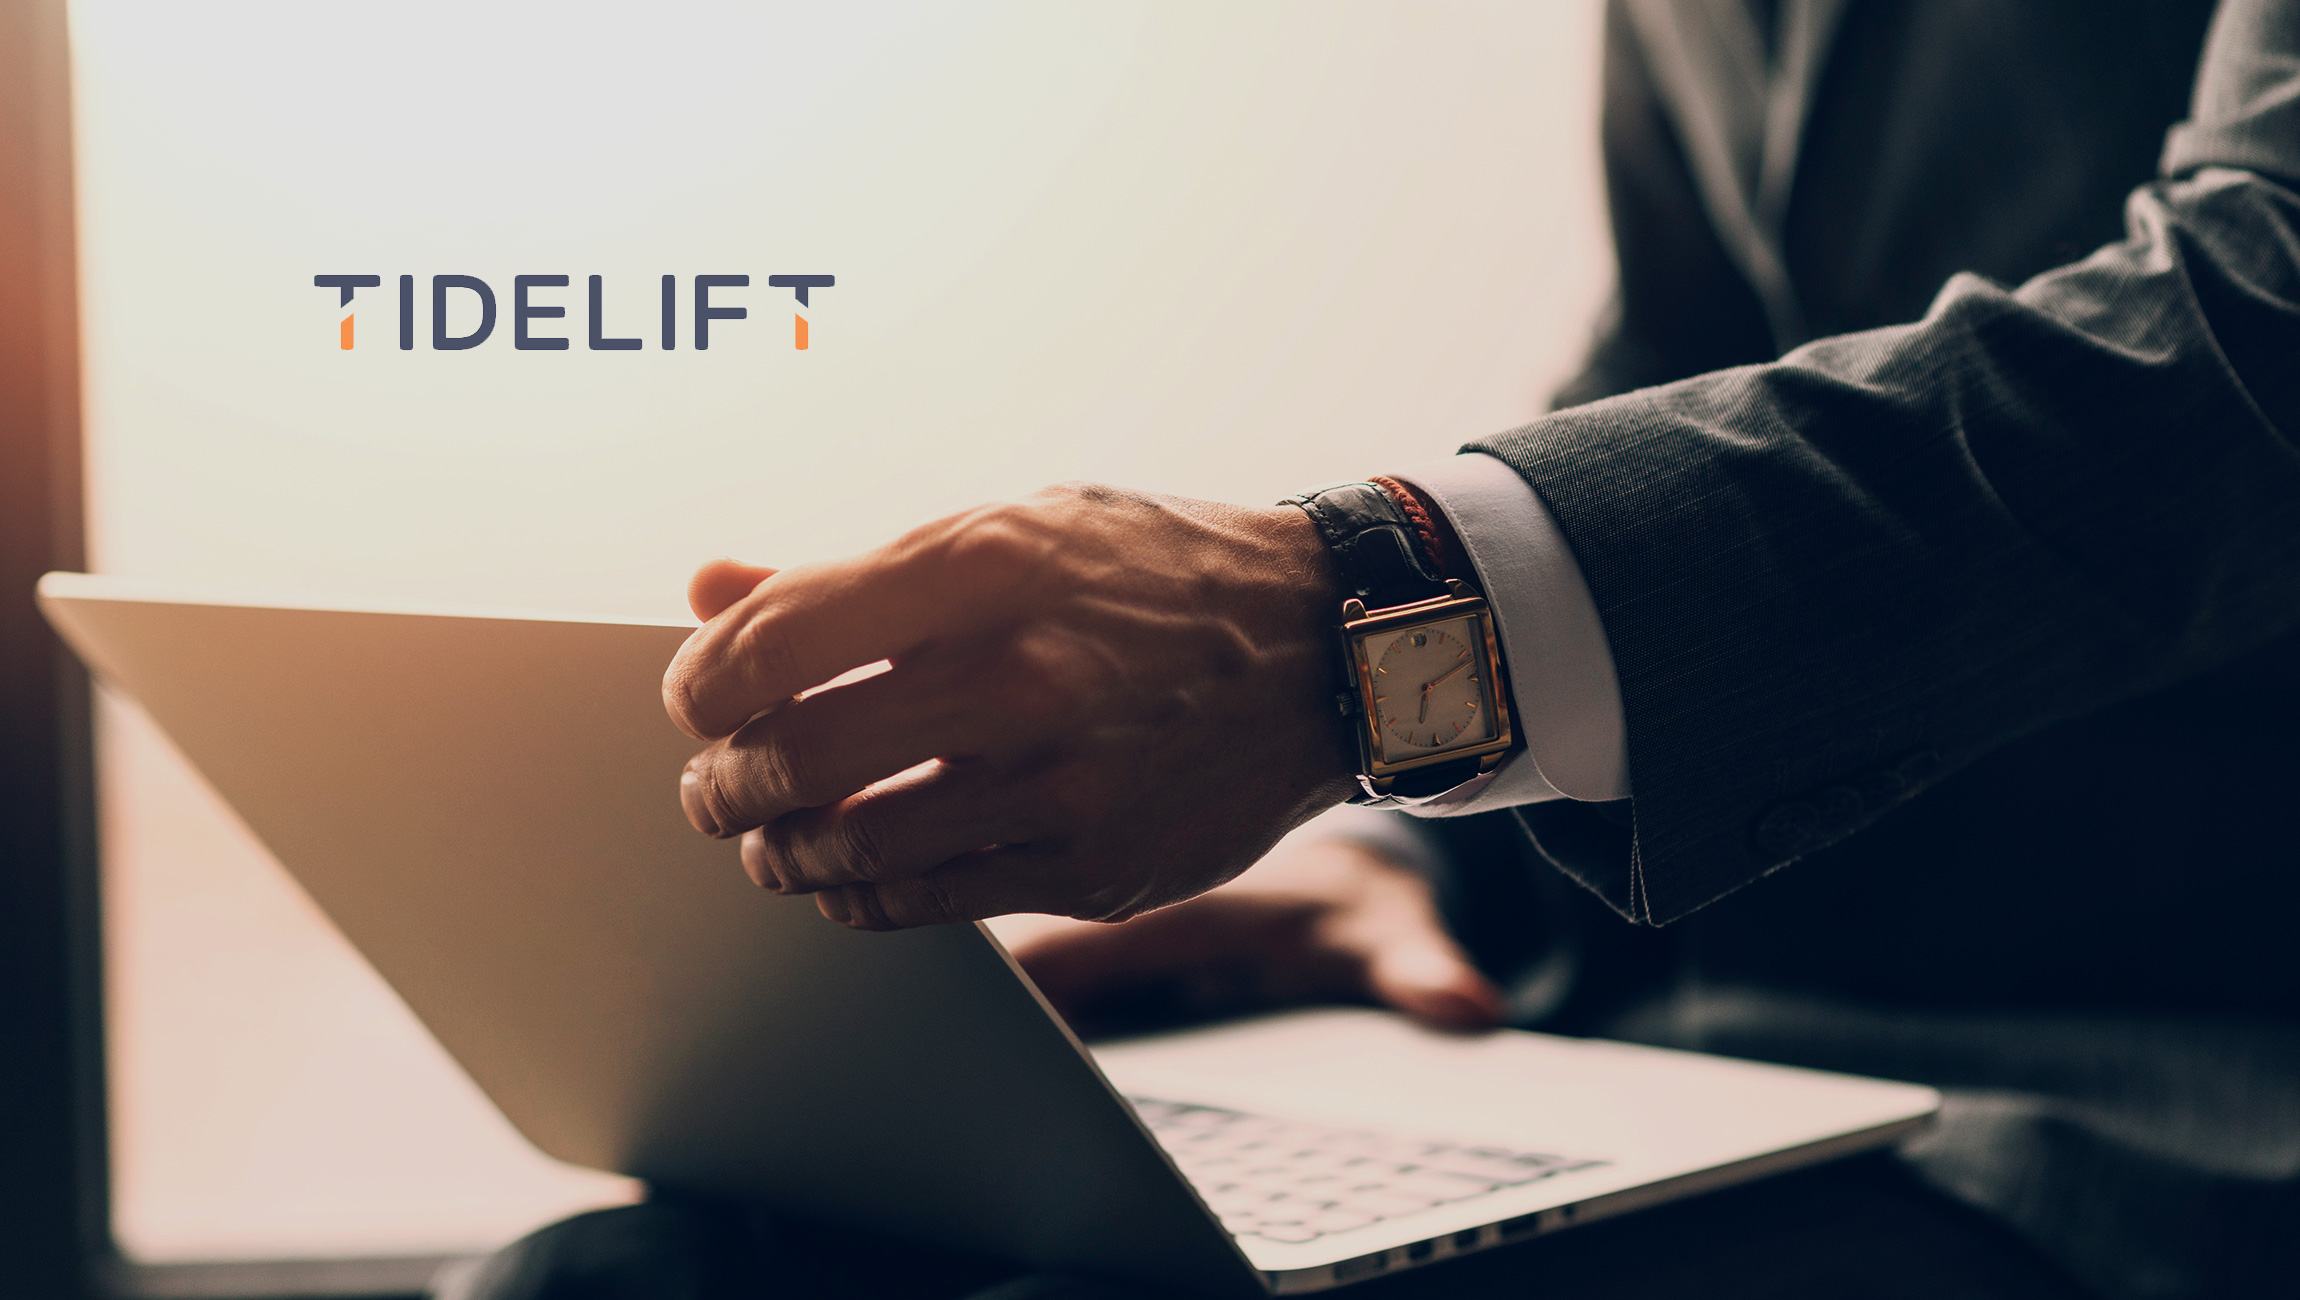 Tidelift Adds Atlassian Bitbucket Integration for Application Development and Devops Teams Leveraging Managed Open Source